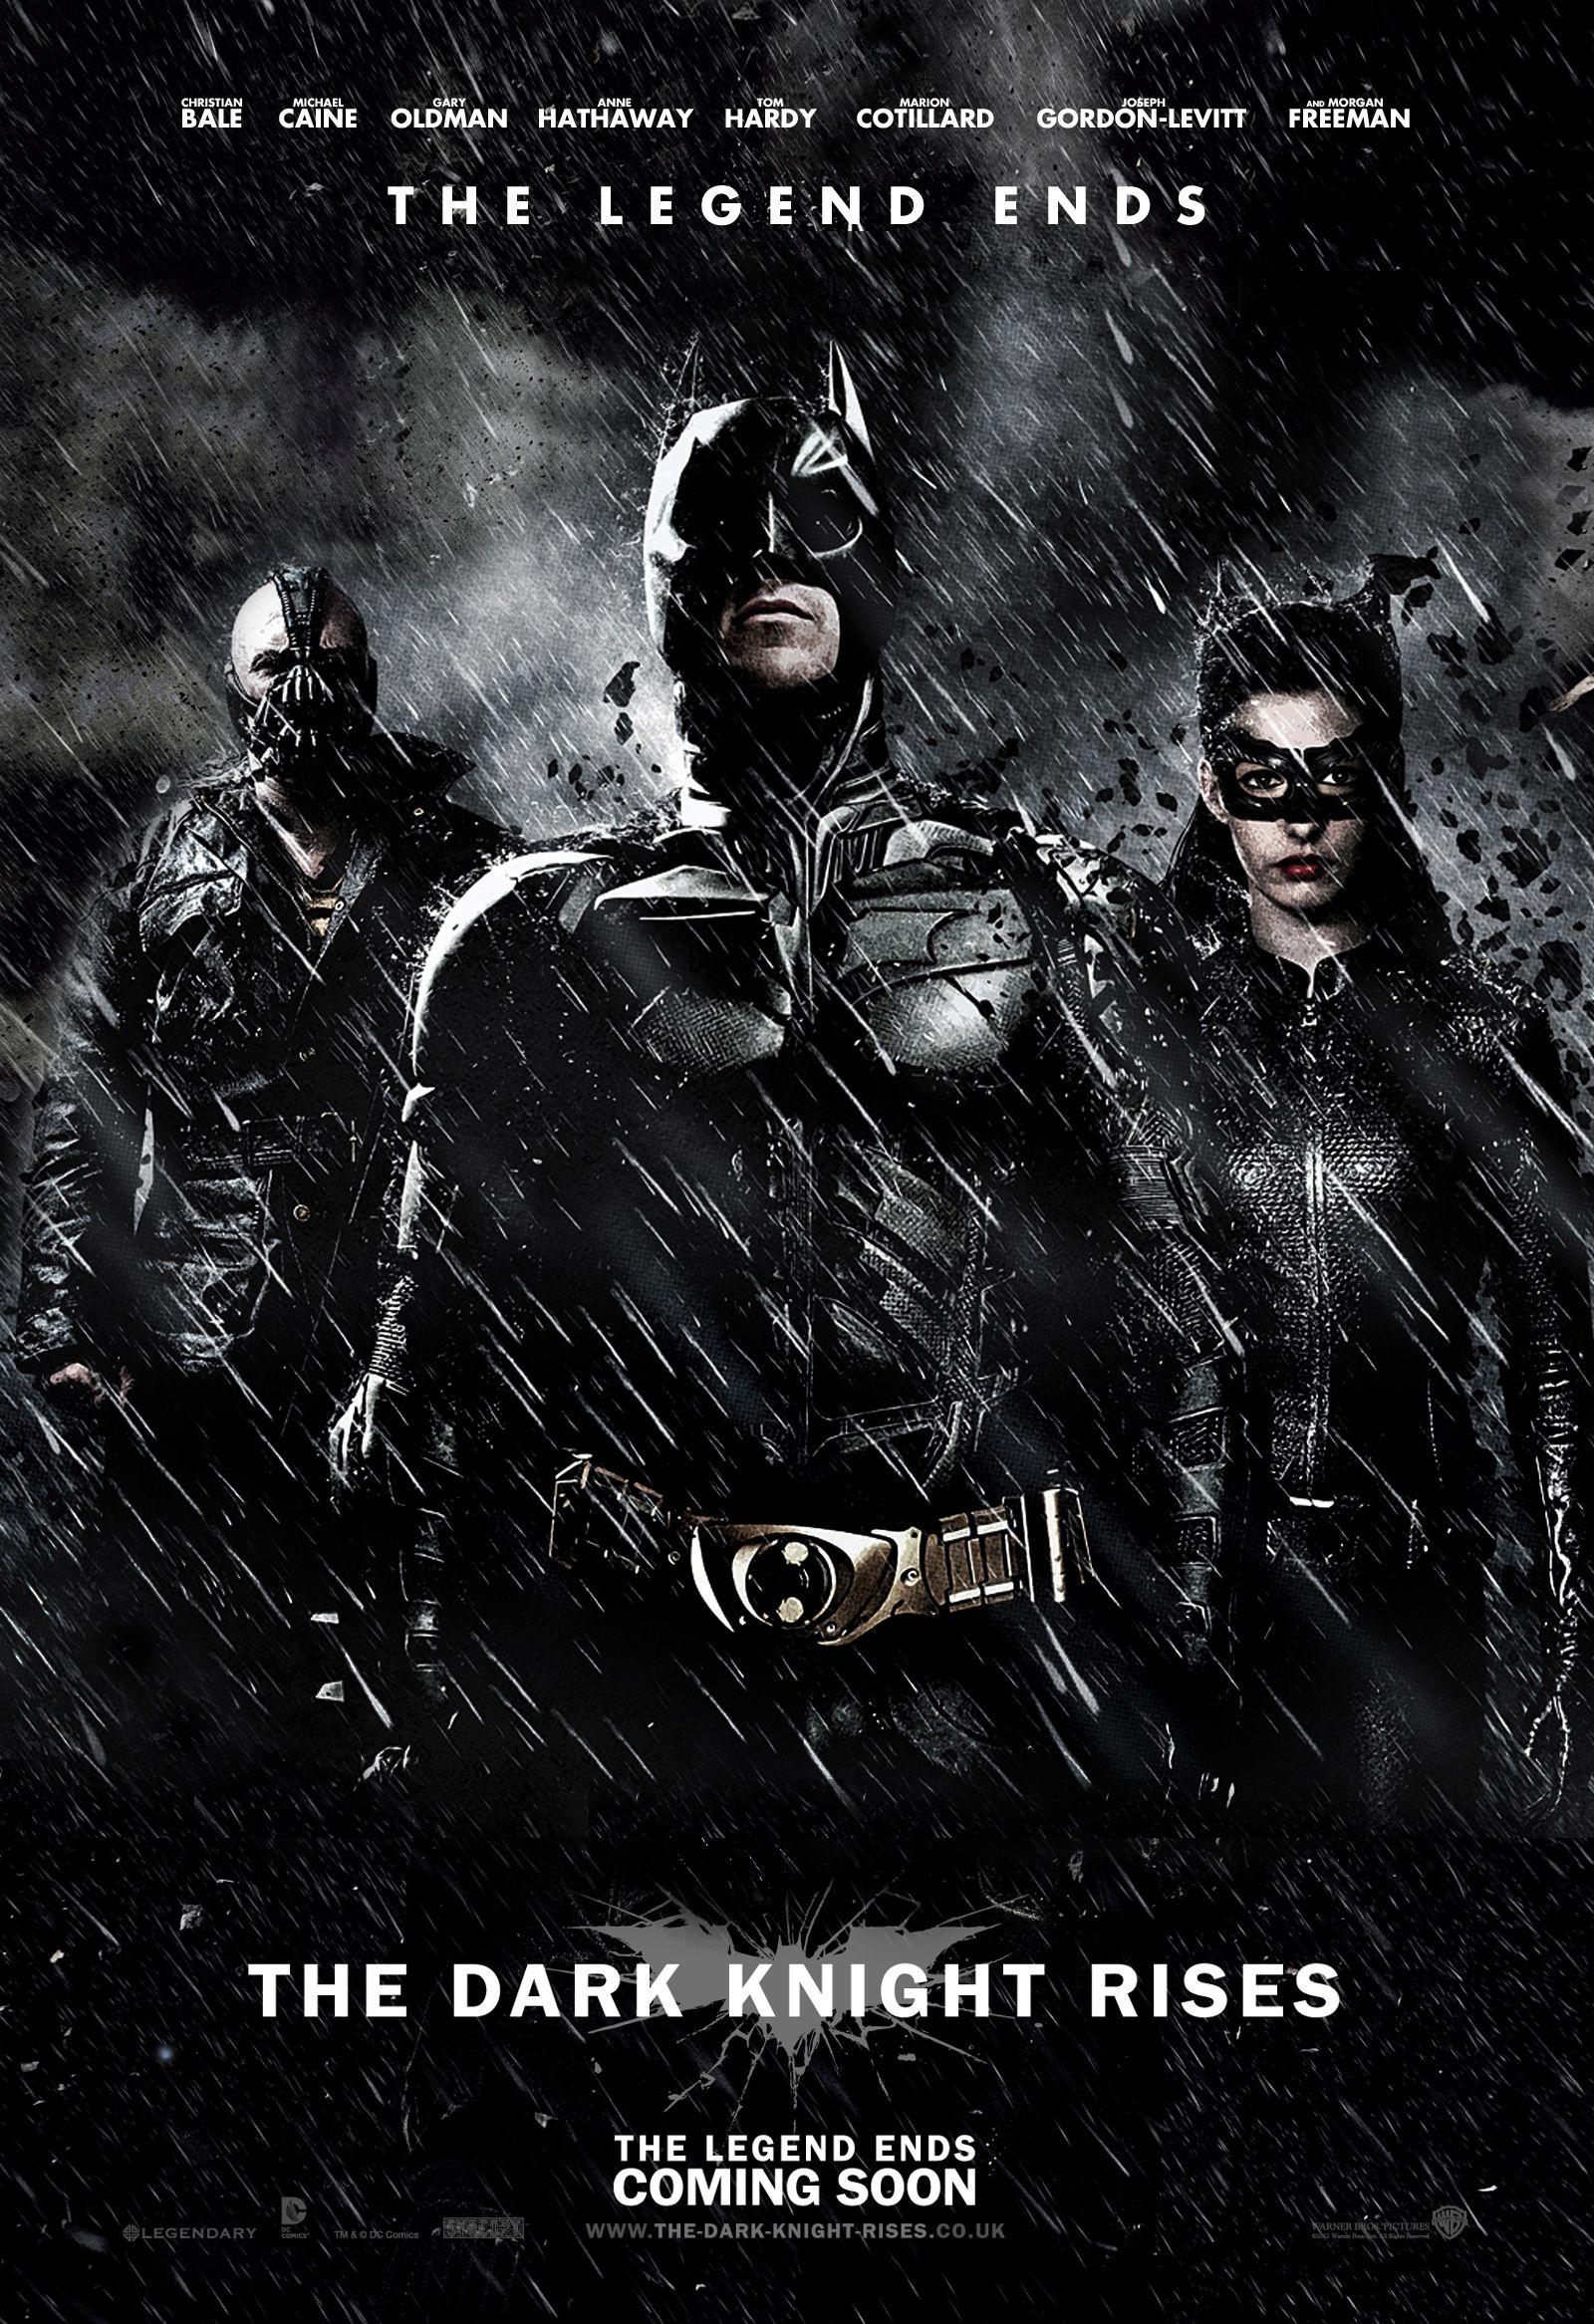 The Dark Knight Rises imdb parents guide | Hot Movie | Dark